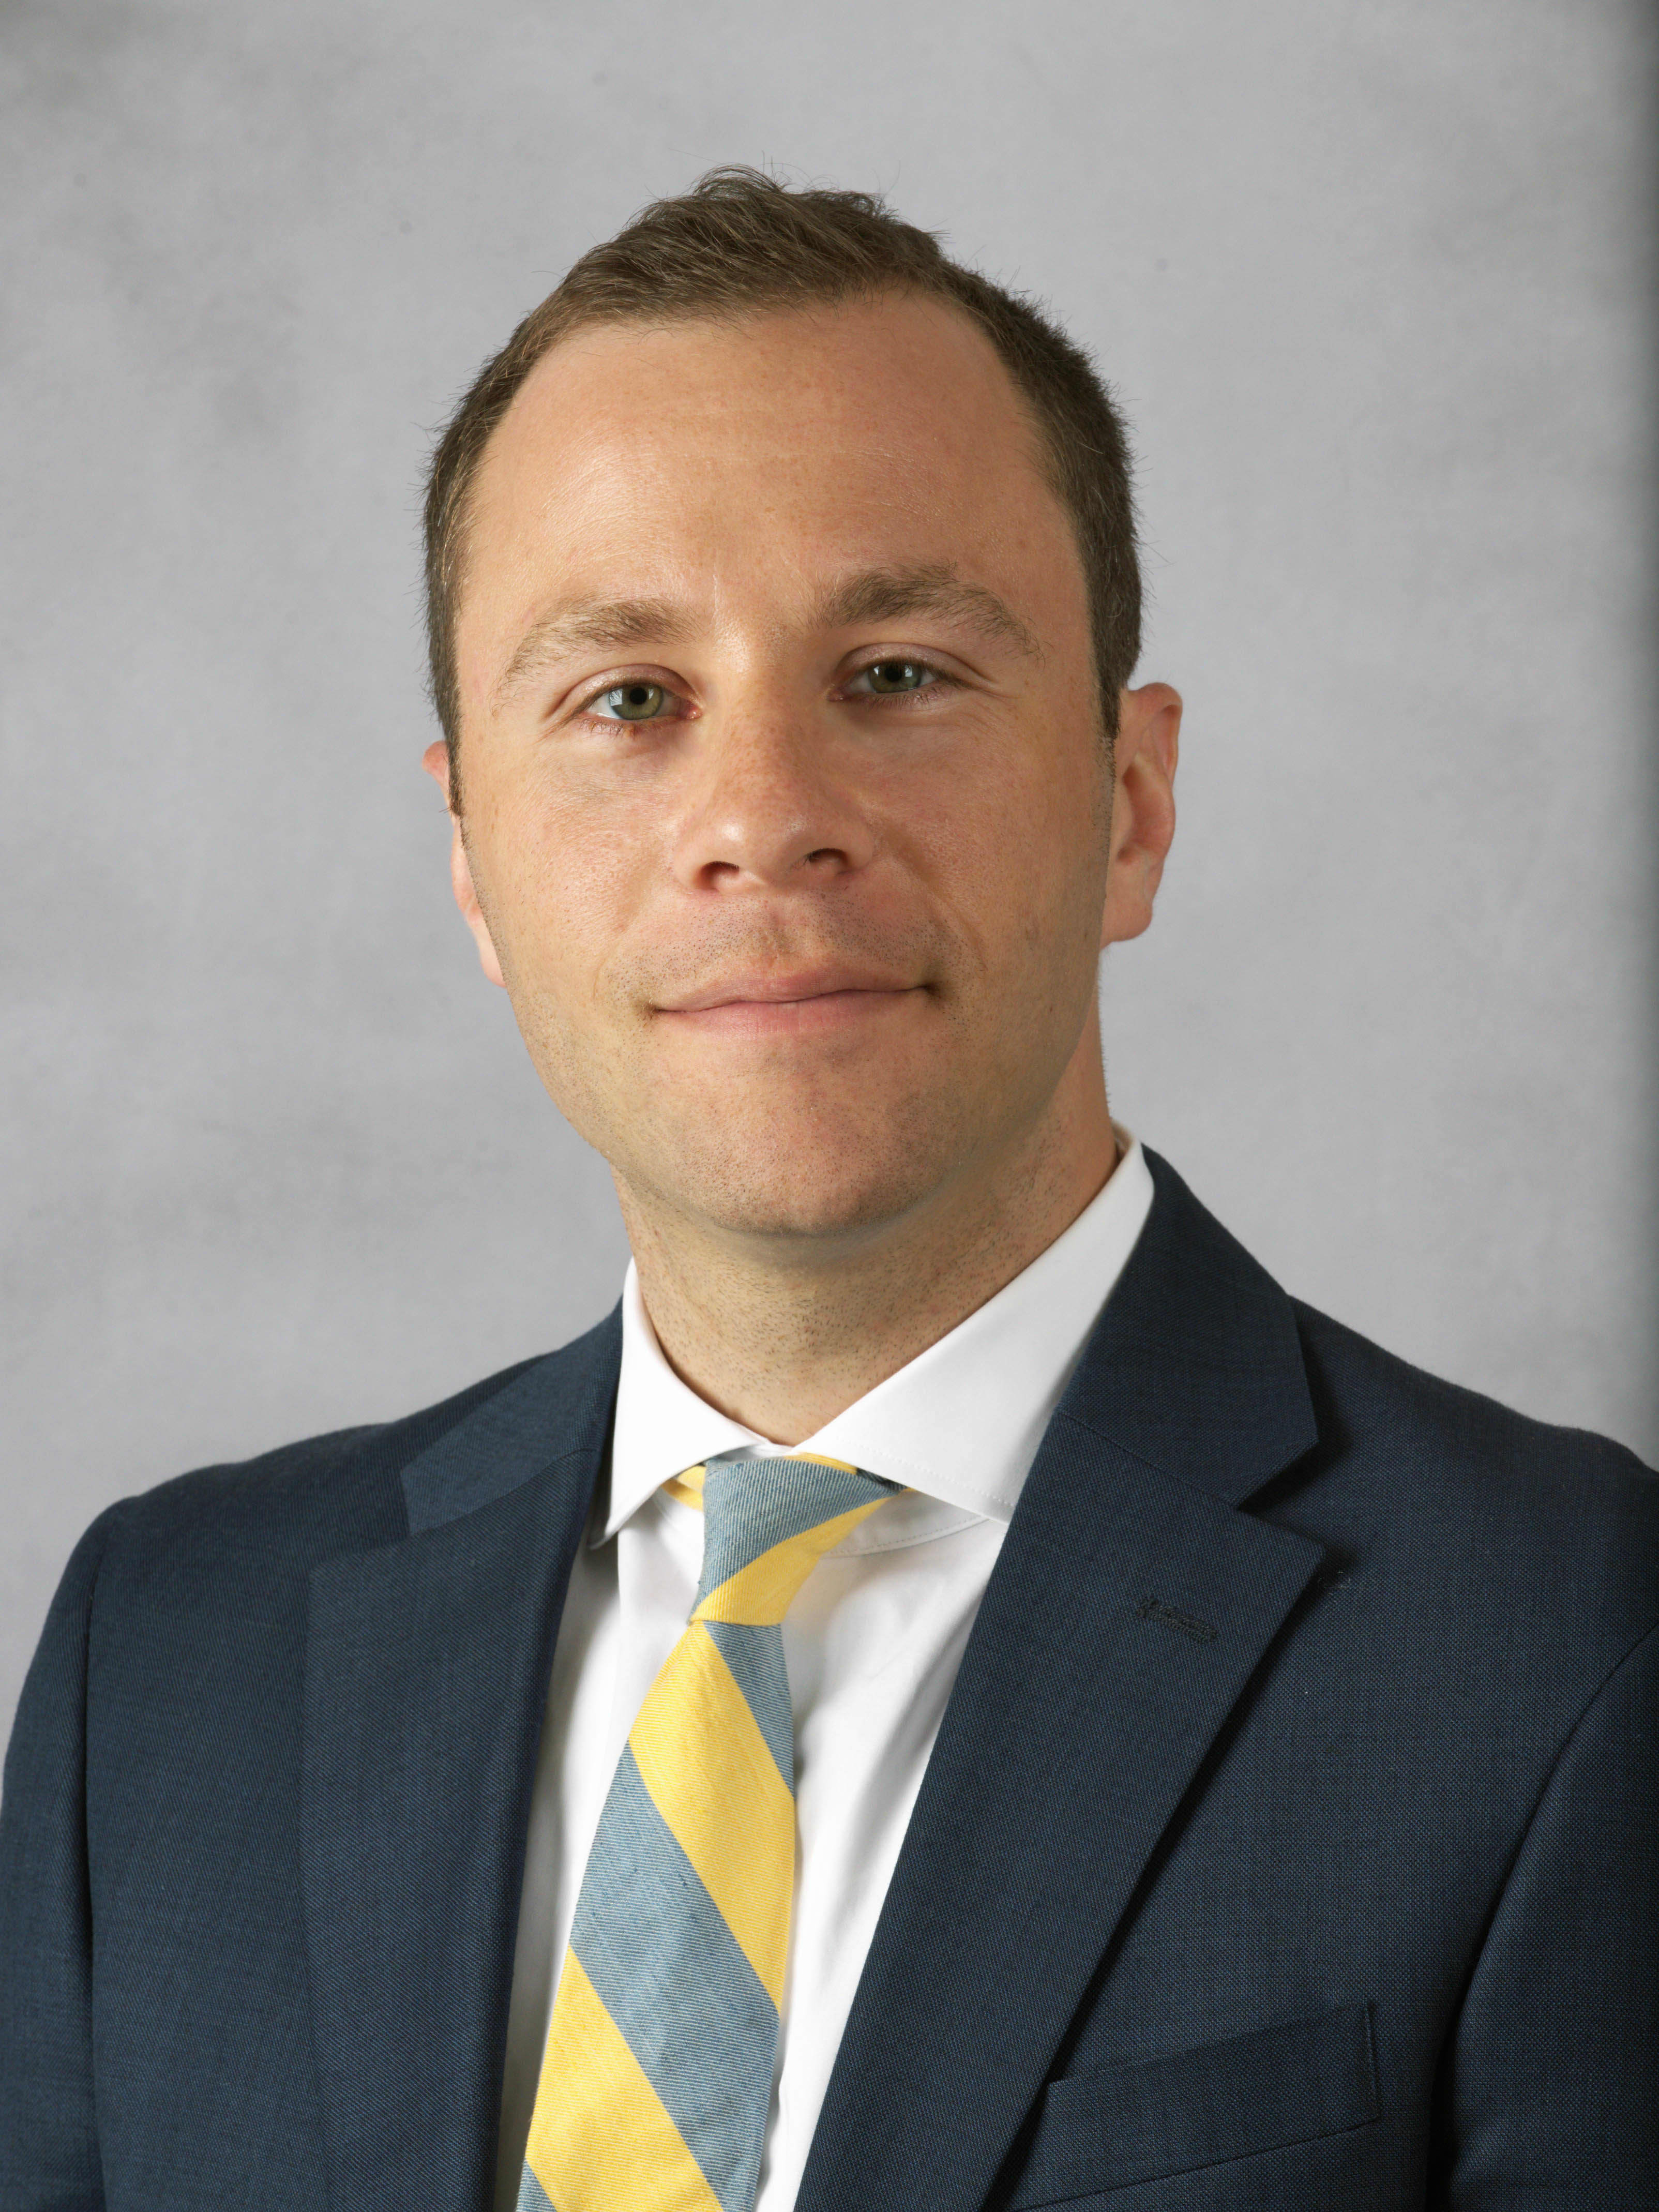 Michael S. Leapman